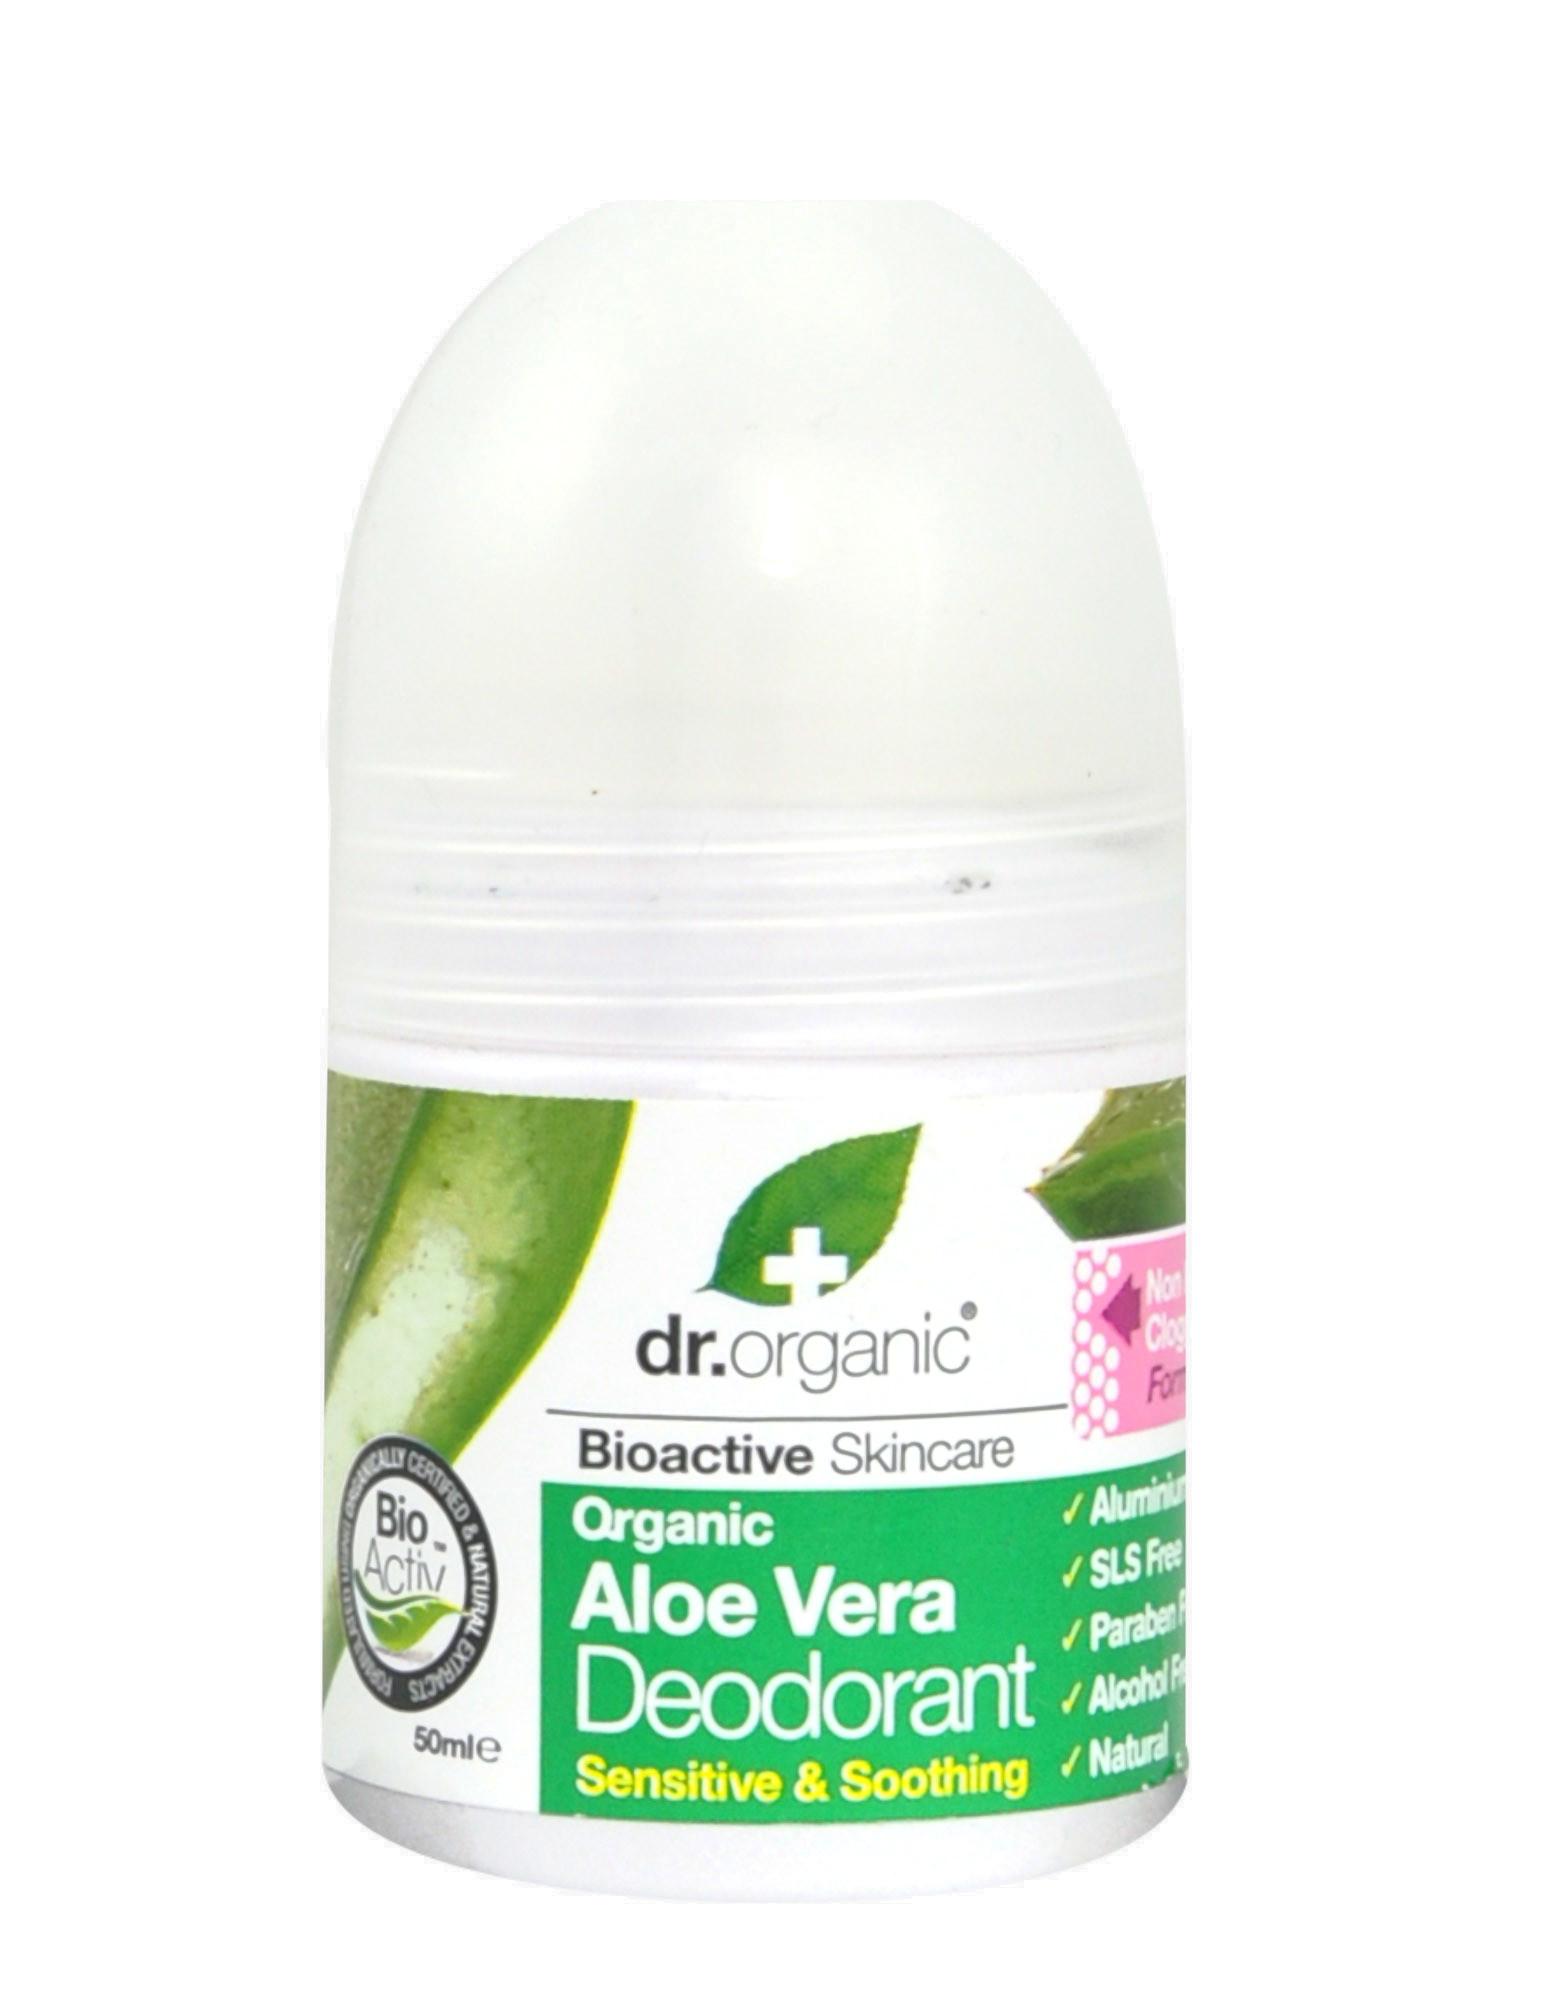 dr organic aloe vera deodorant